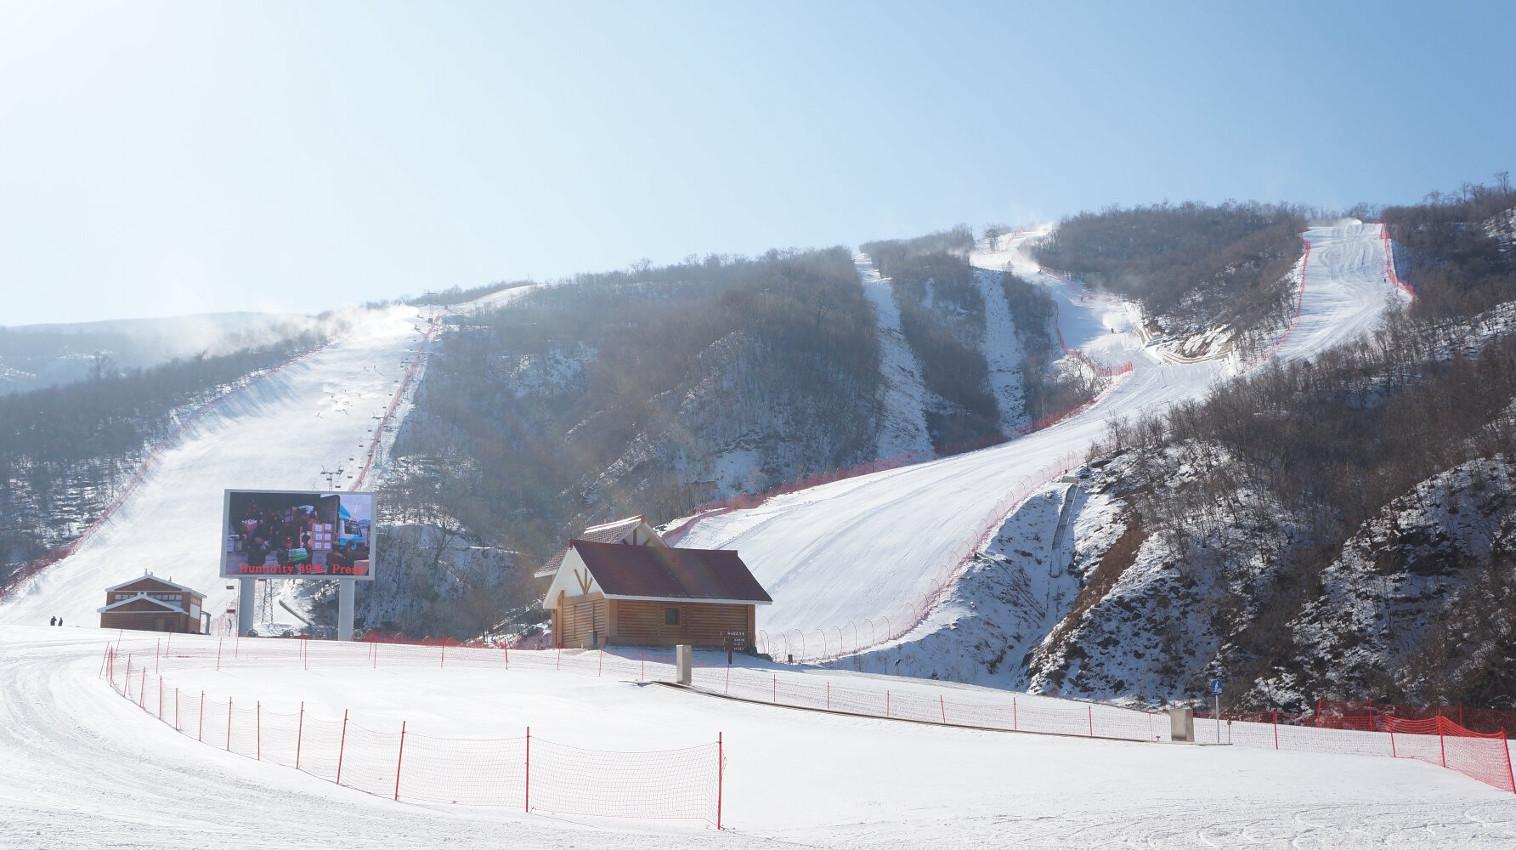 Slopes at North Korea Ski Resort